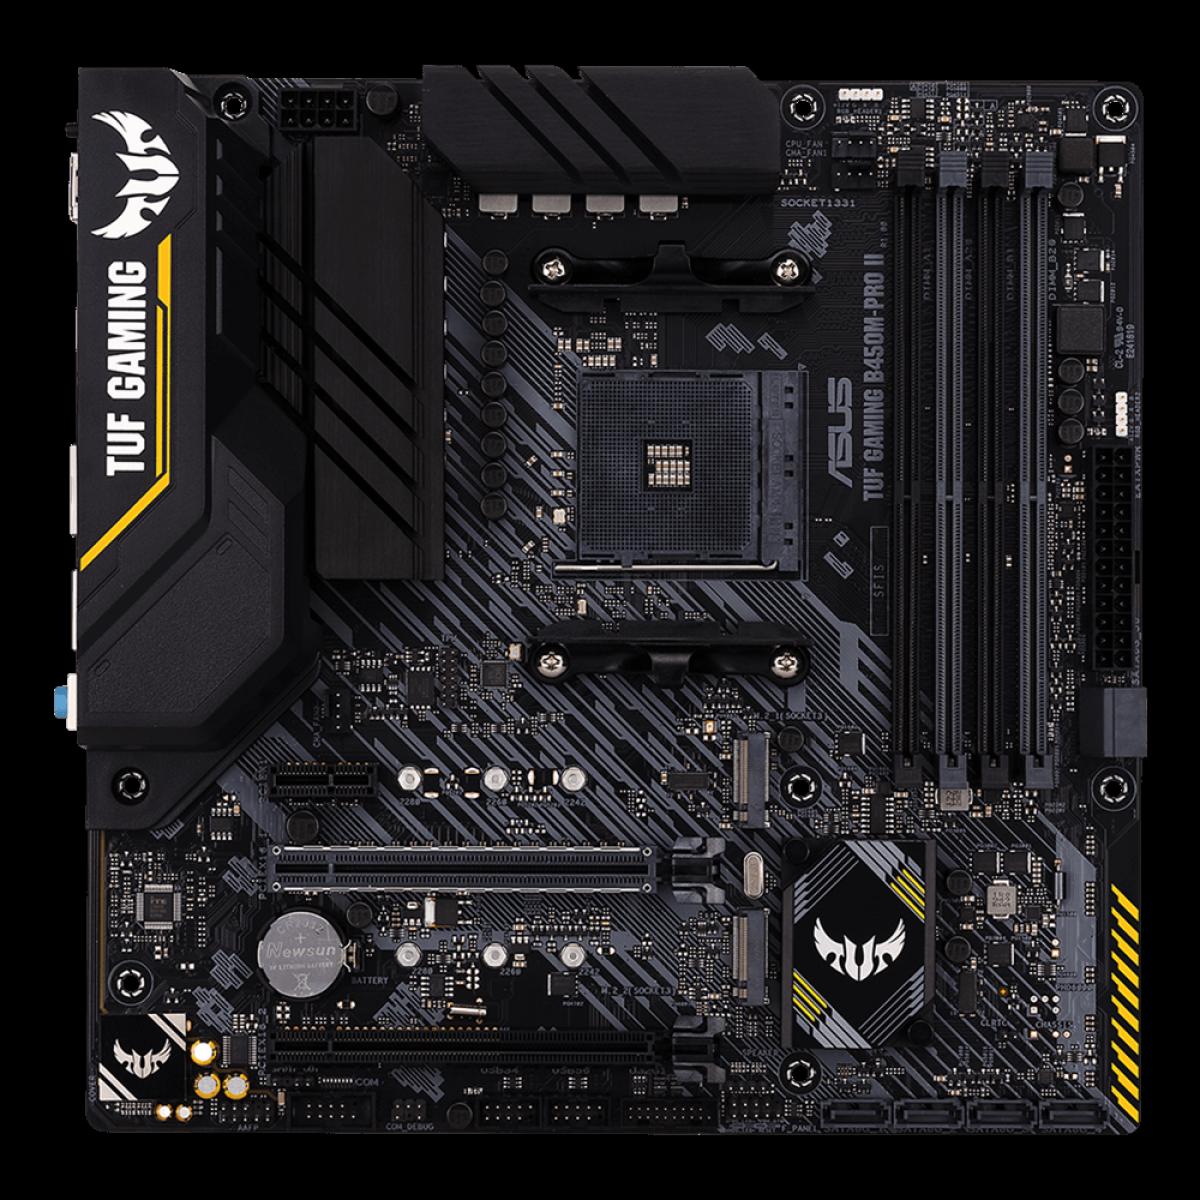 Placa Mãe ASUS TUF GAMING B450M-PRO II, Chipset B450, AMD AM4, mATX, DDR4, 90MB1610-M0EAY0